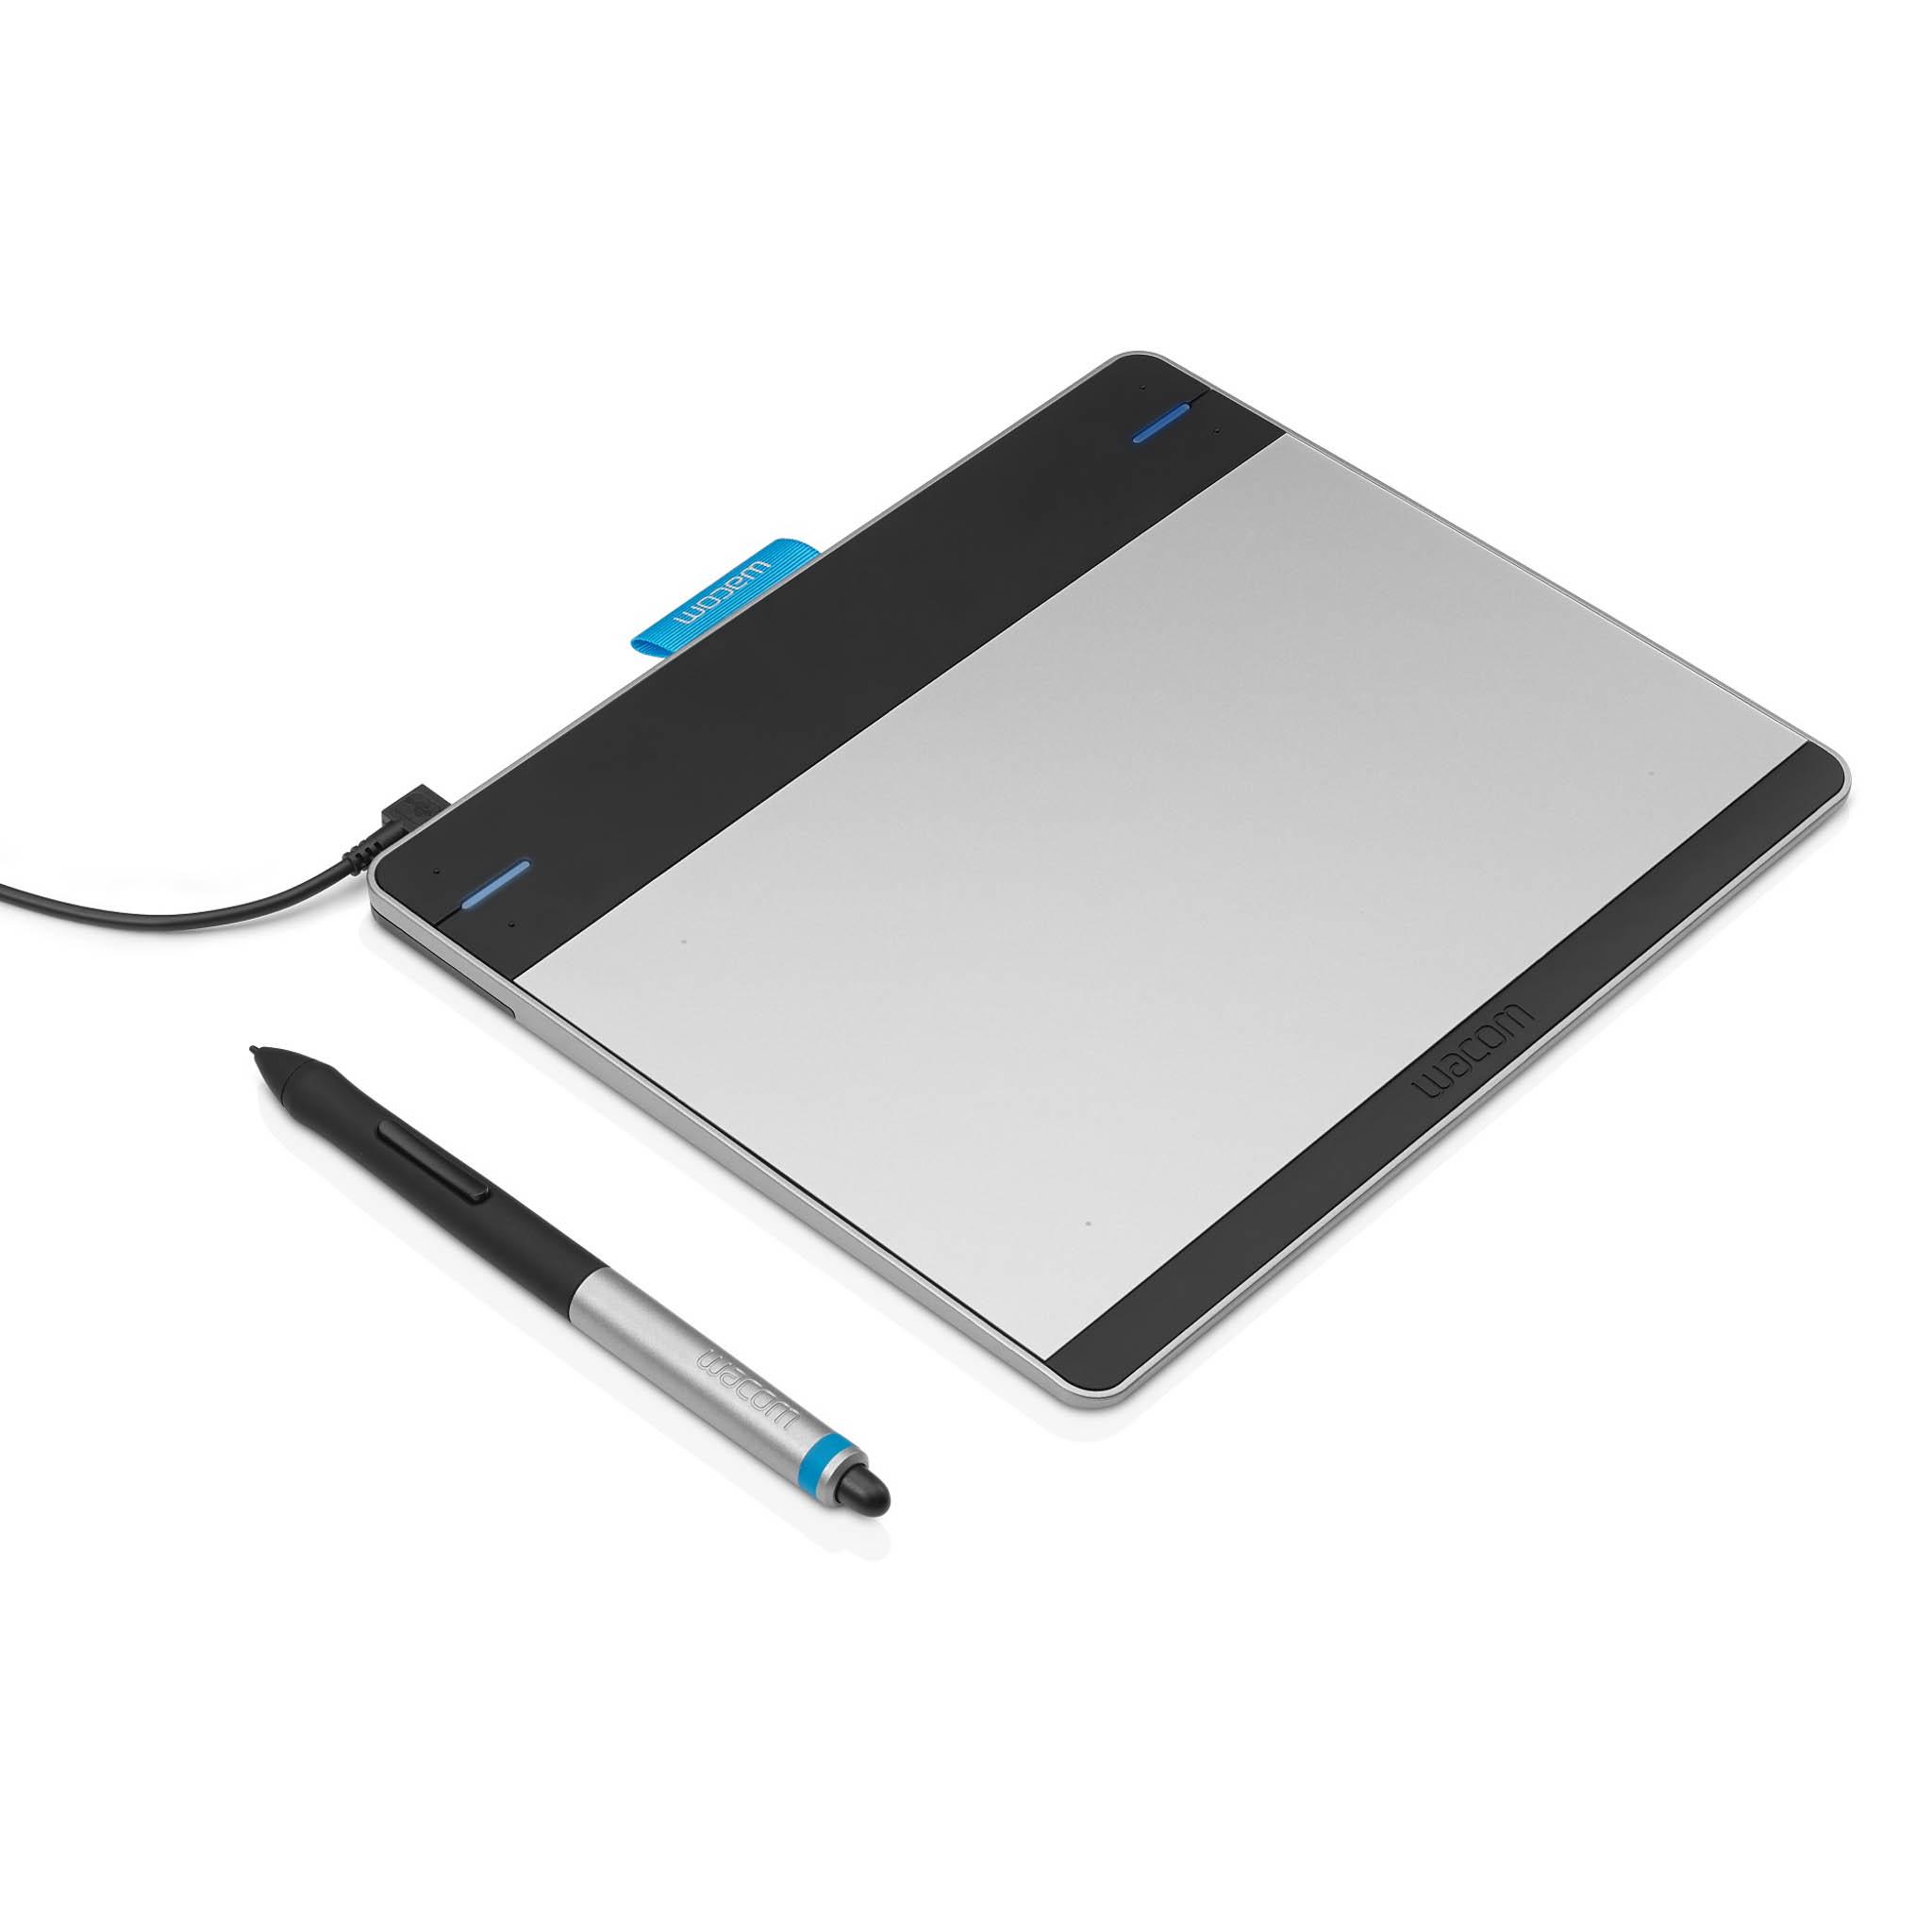 93bbf0bd6cef Wacom Intuos Creative Digital Pen and Touch Pad - Mac Prices Australia